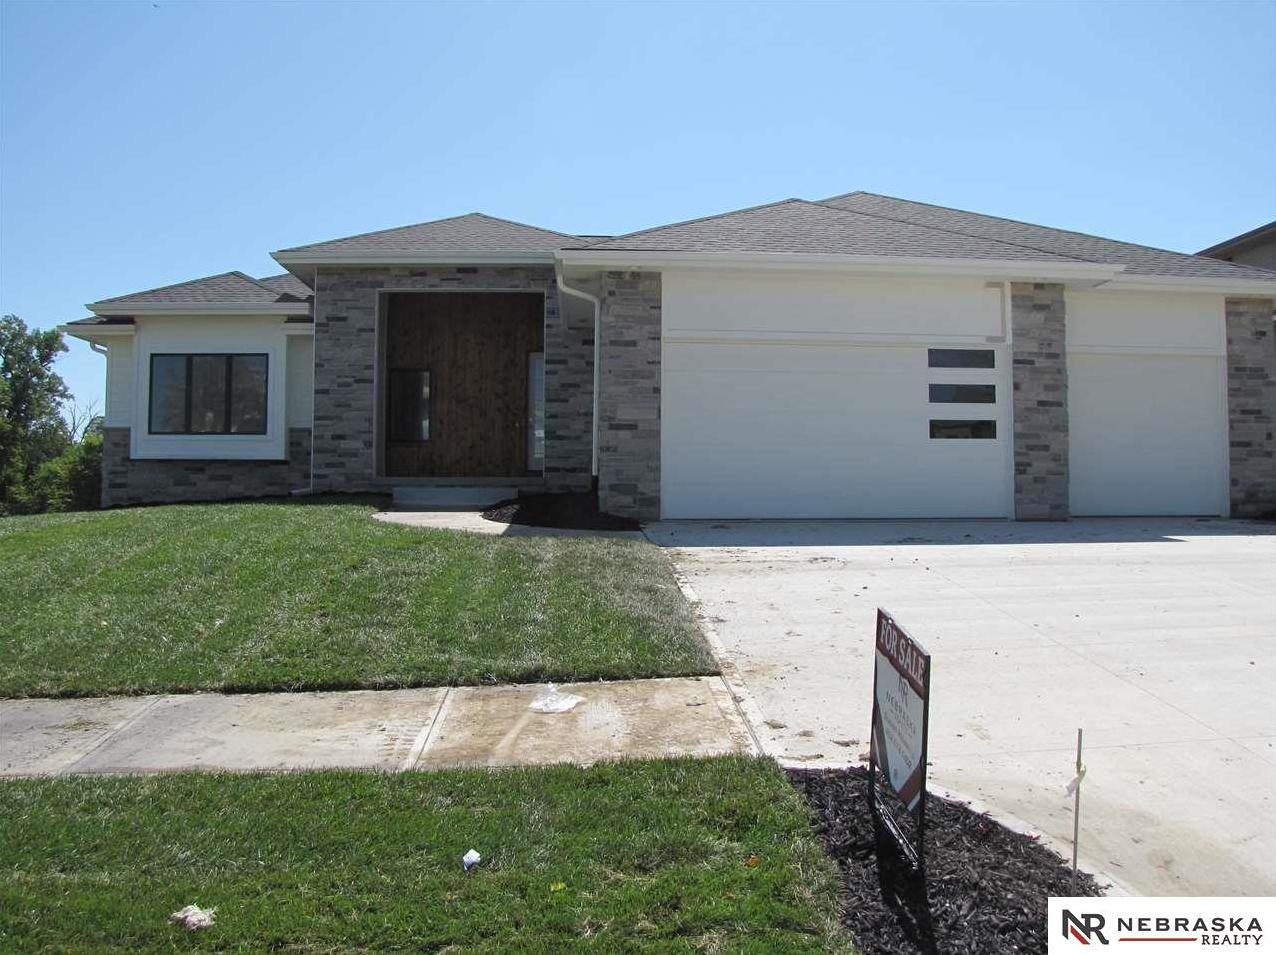 Photo of 21111 B Street Omaha NE 68022